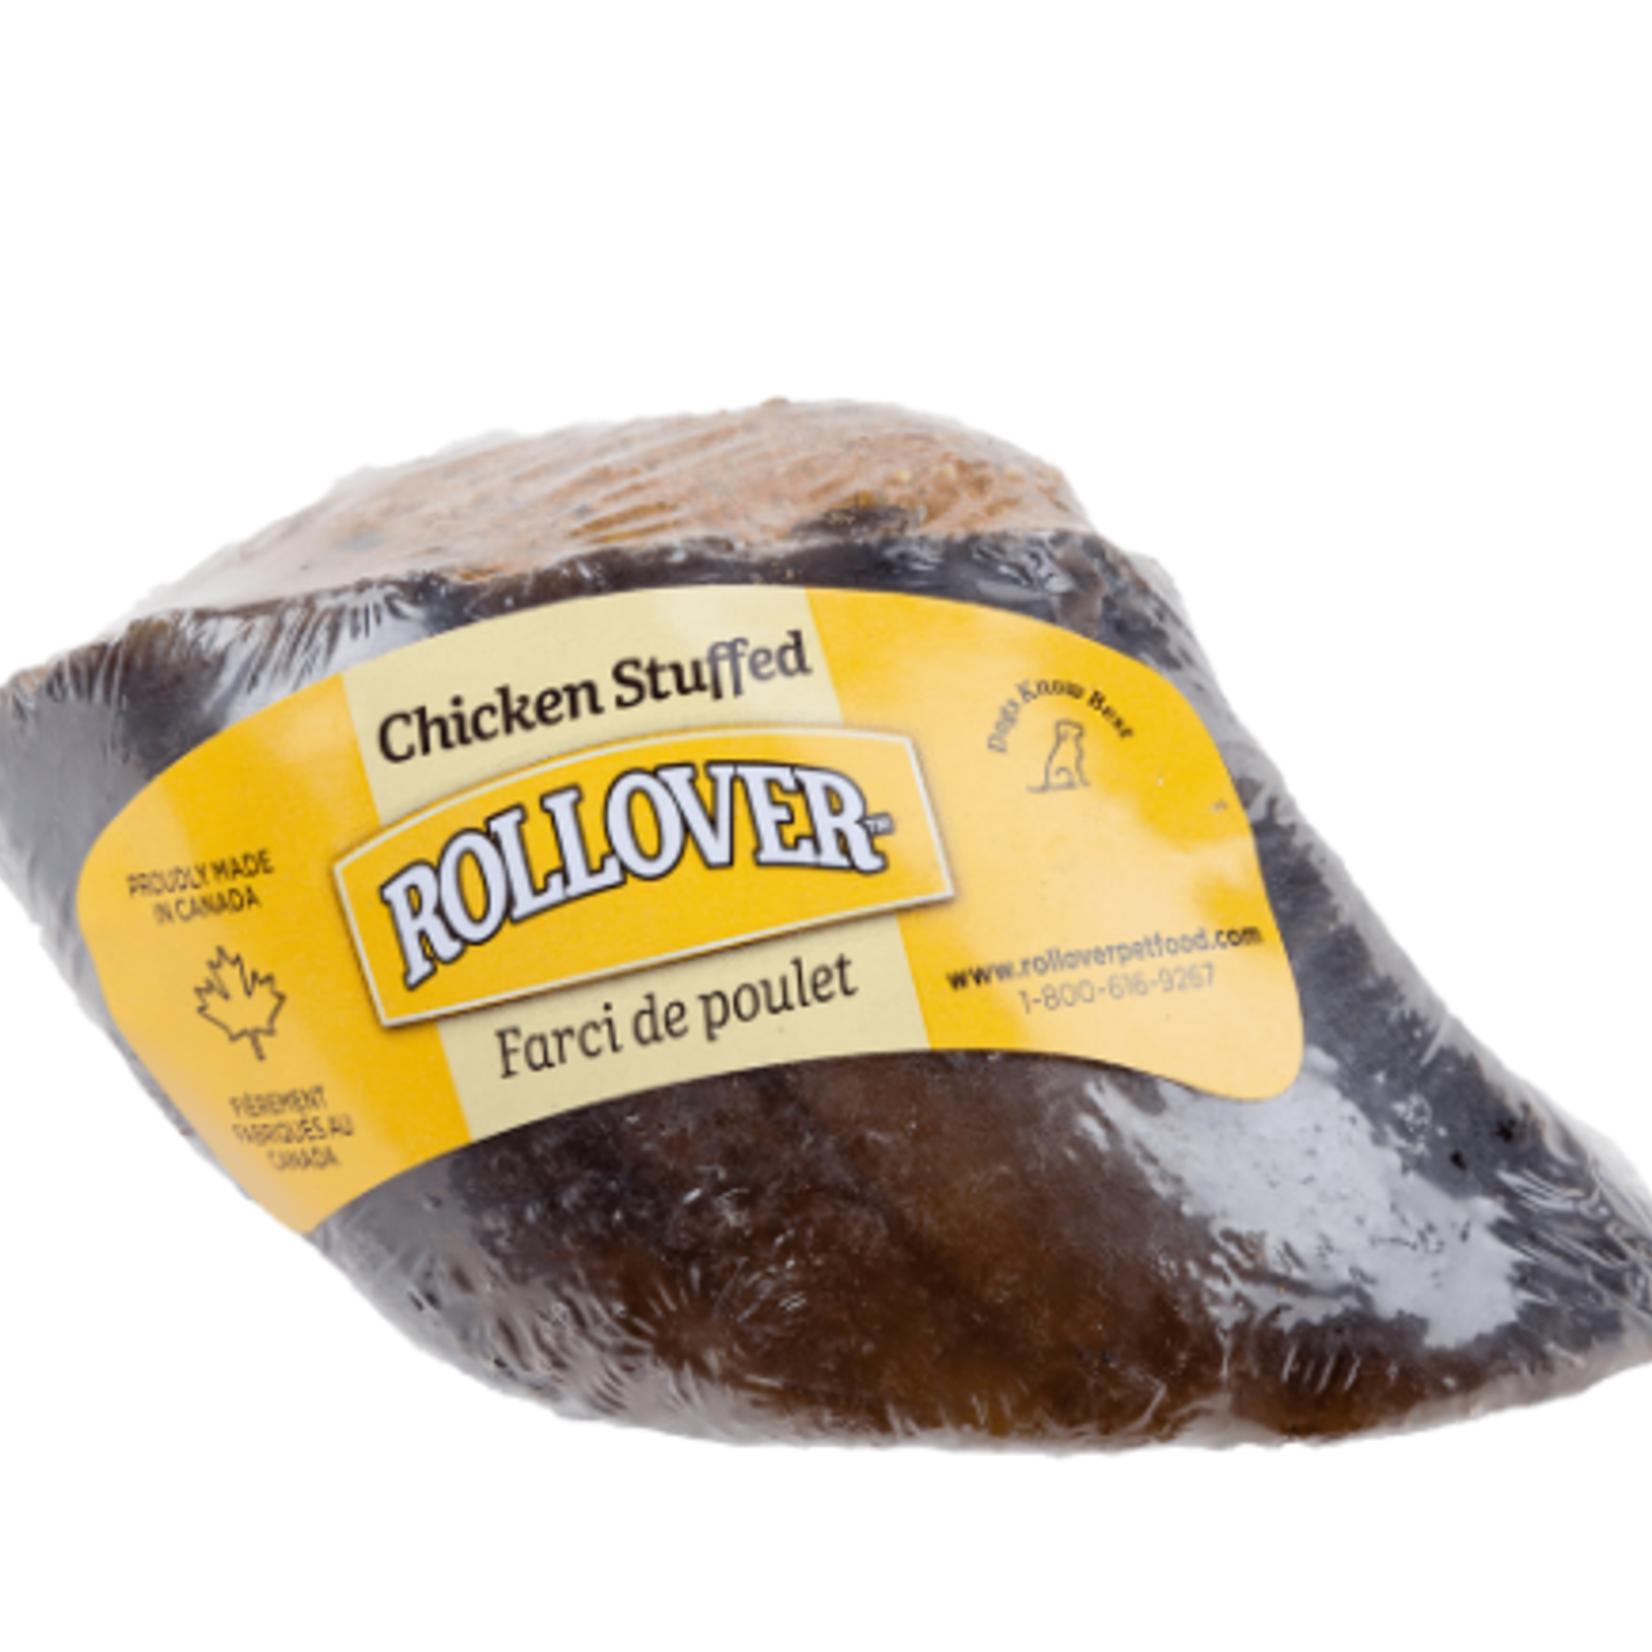 Rollover Sabots farcis